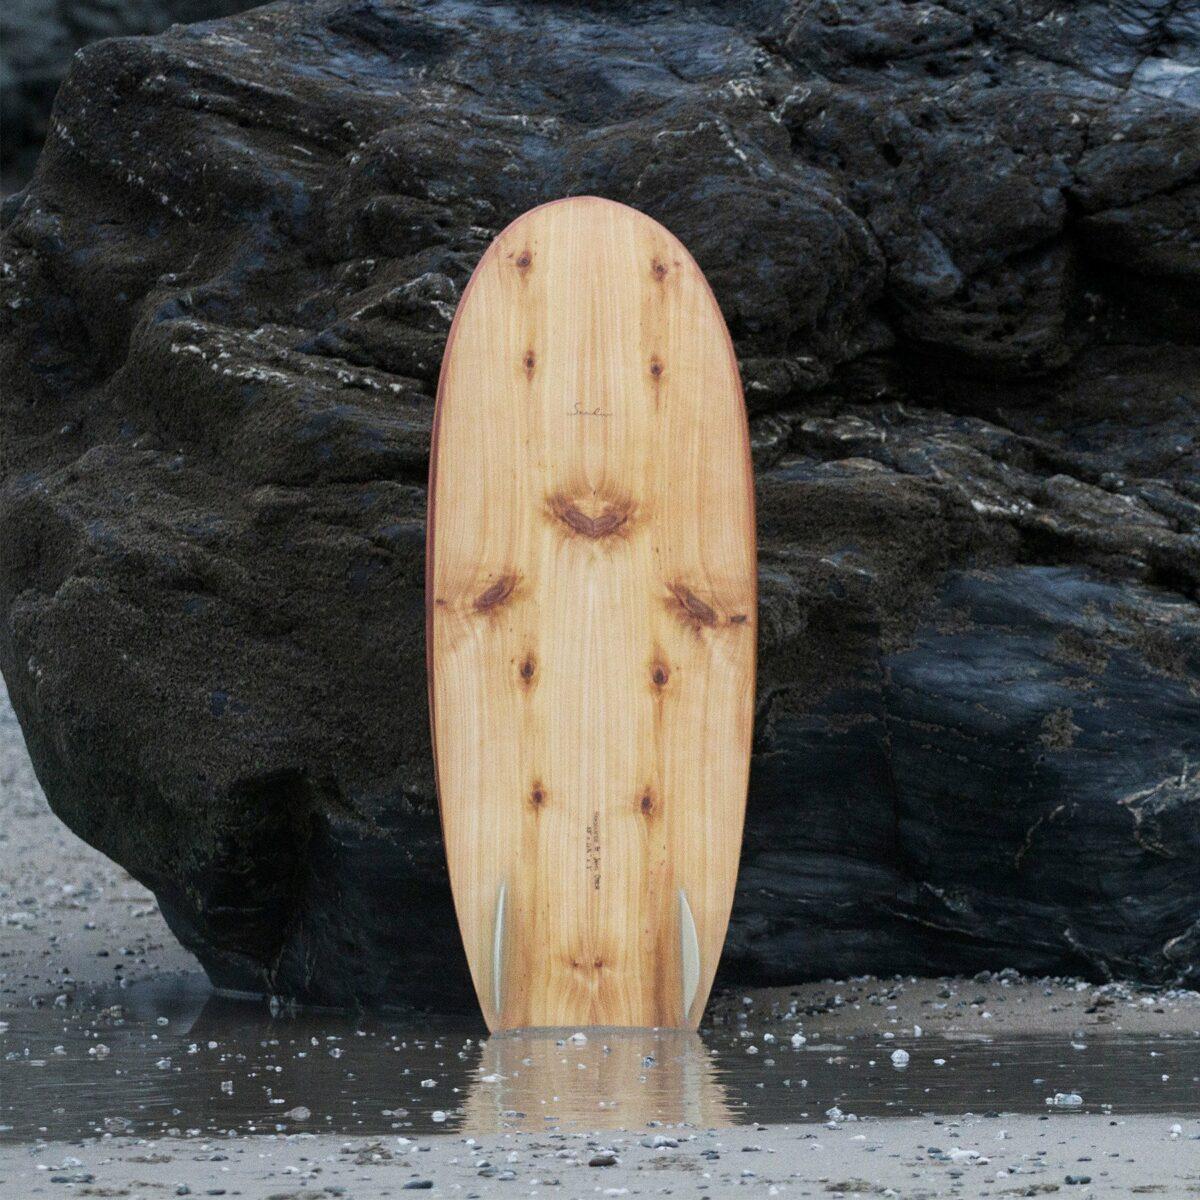 otter wooden surfboard seadar mini simmons product